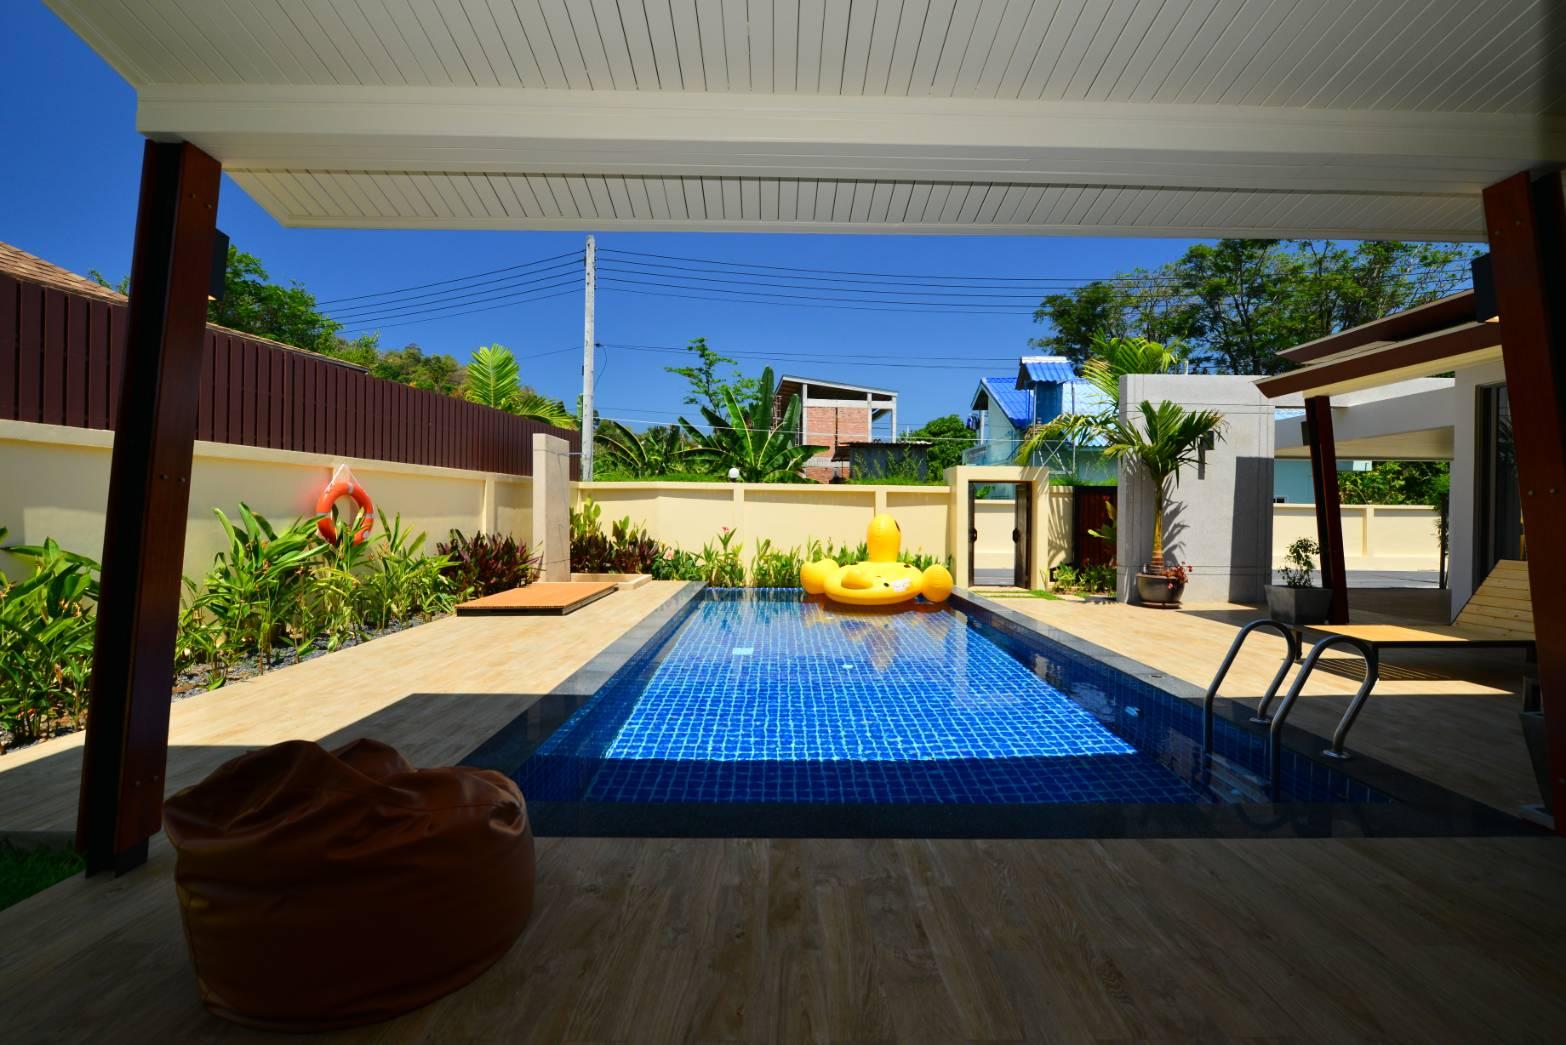 3 Bedroom private Garden villa